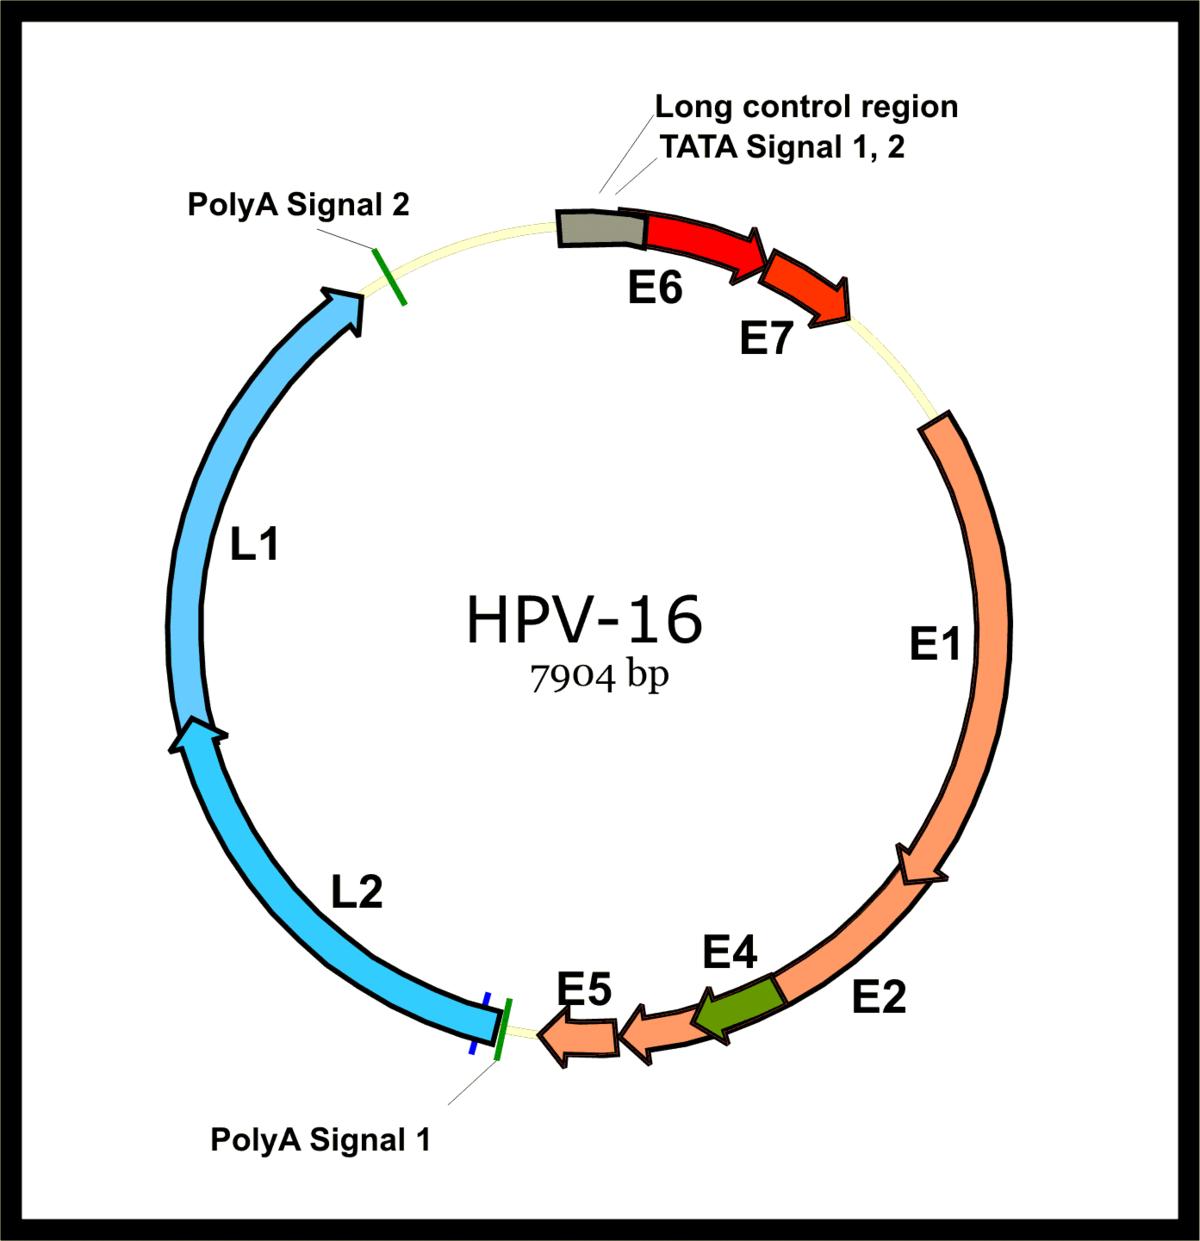 papillomavírus 16 helmintox pyrantelum